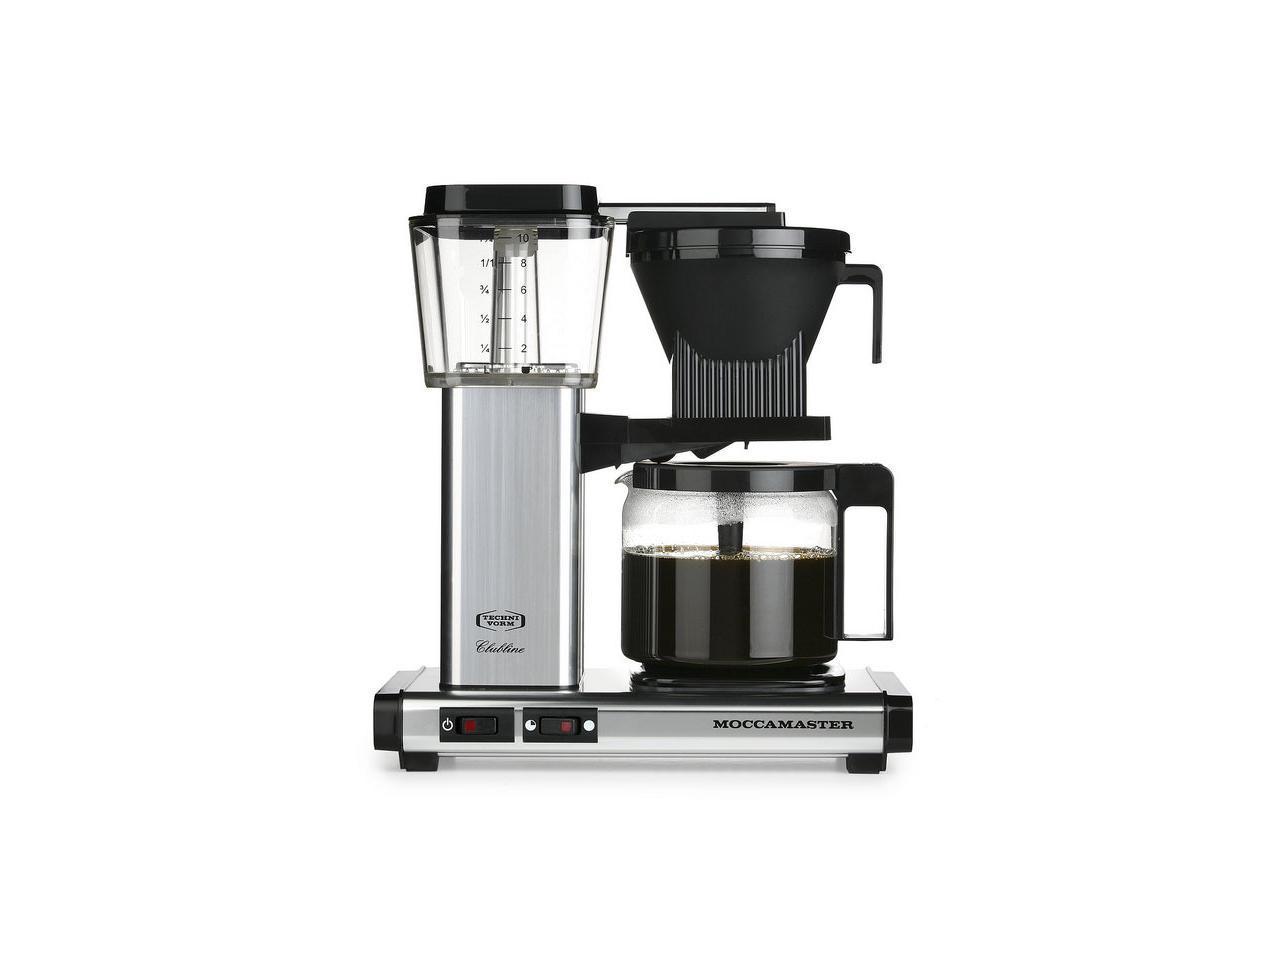 Factory Refurb Technivorm Moccamaster coffee machine $199 + tax for California, free shipping